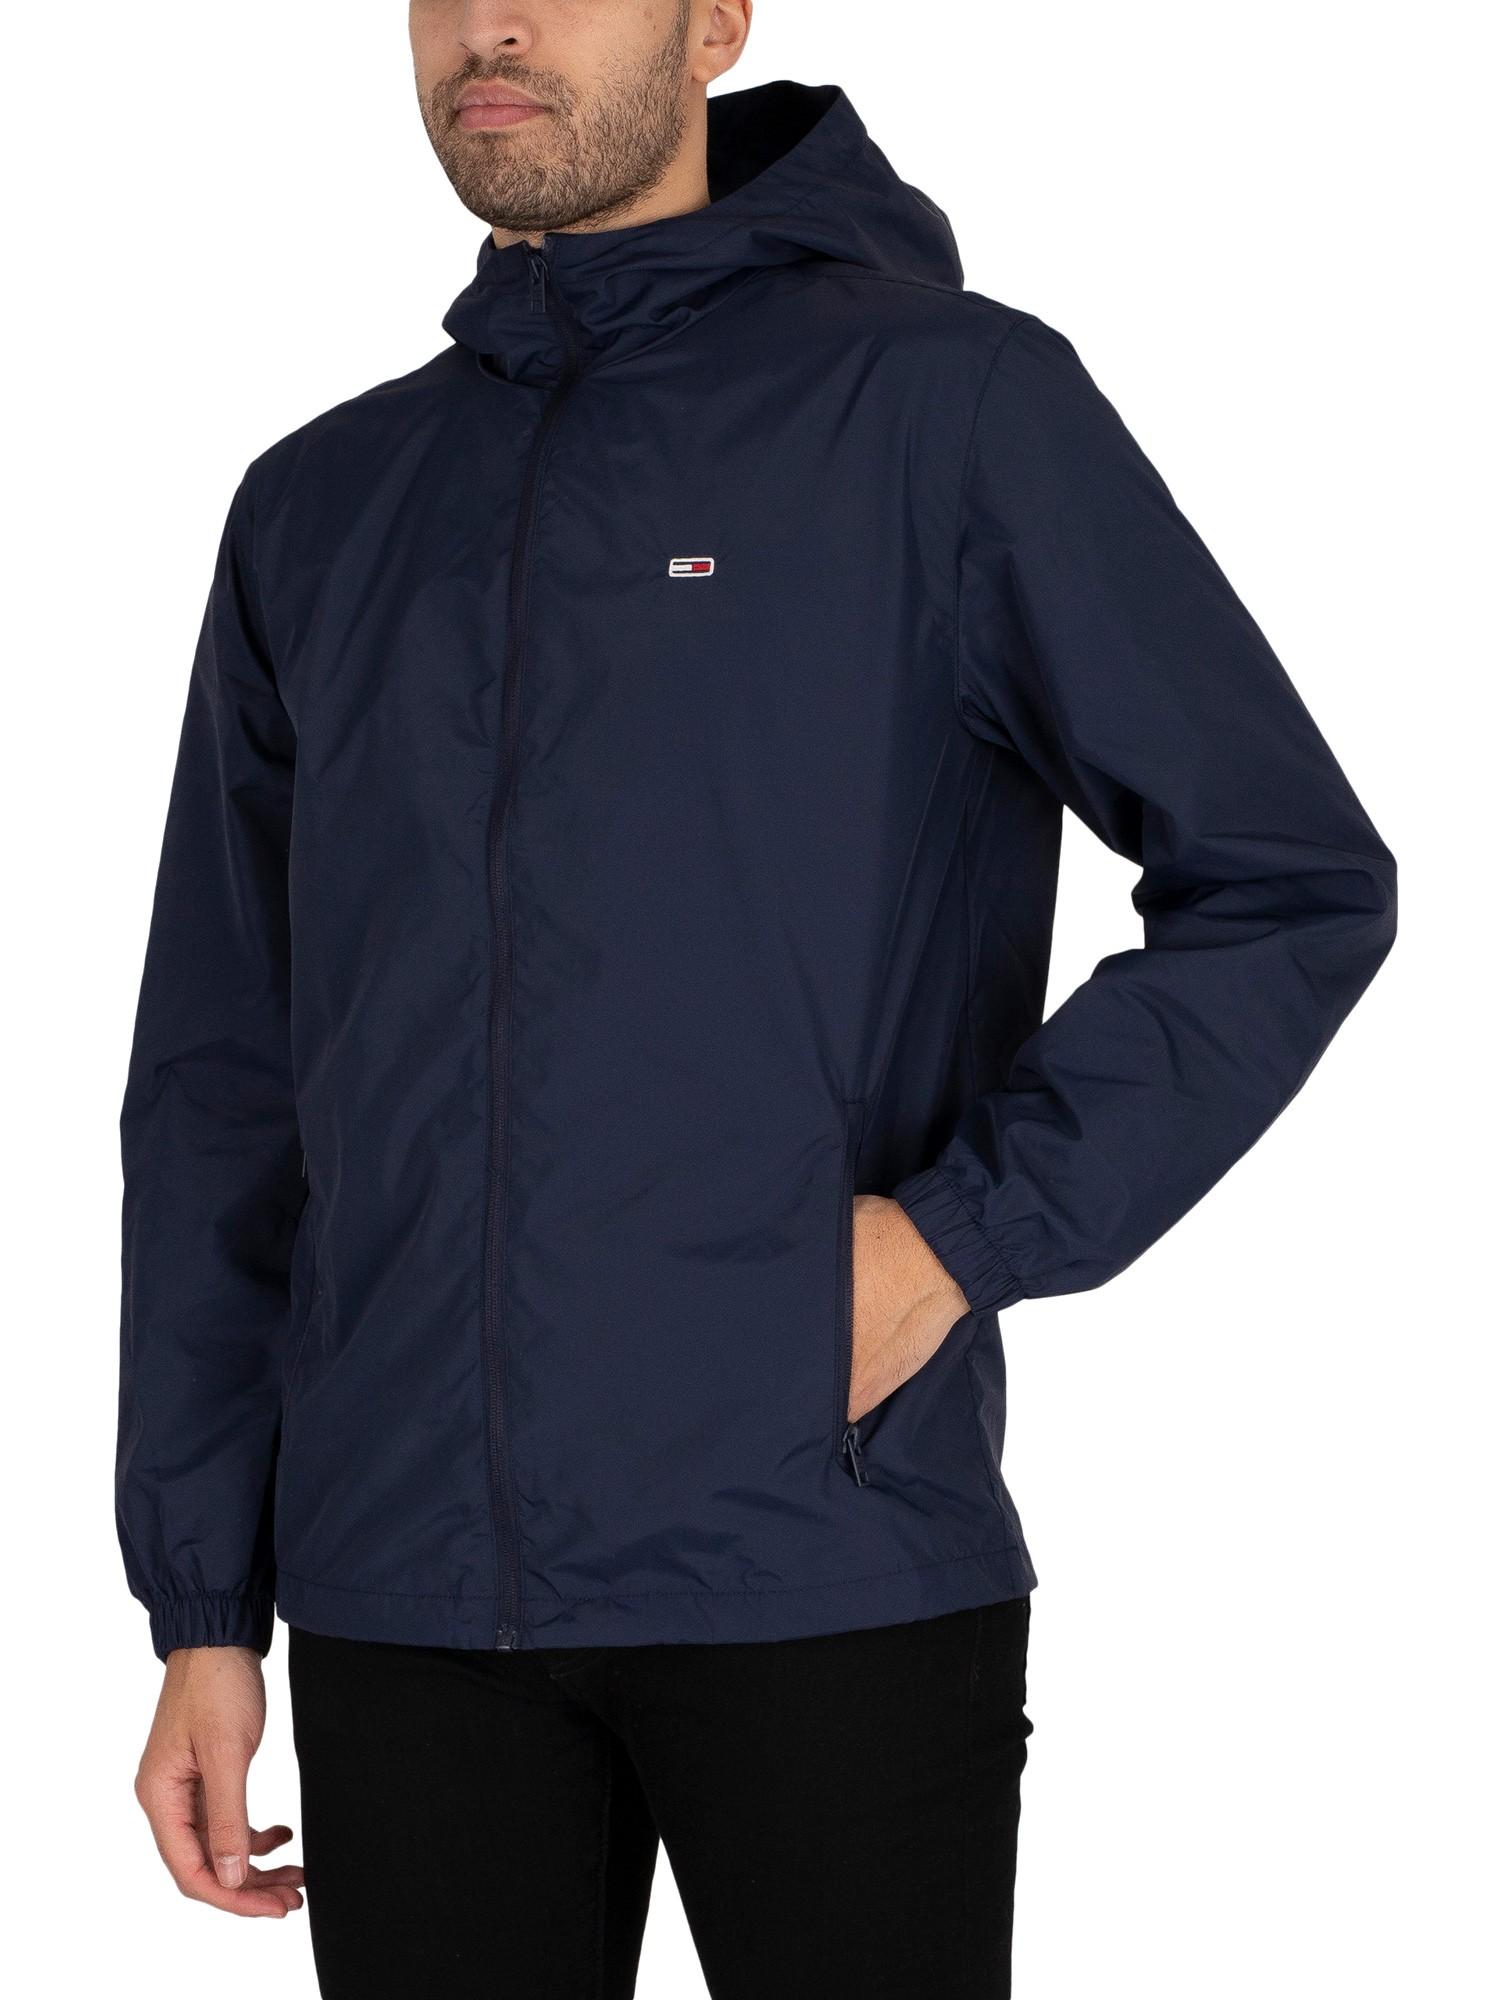 Packable Windbreaker Jacket